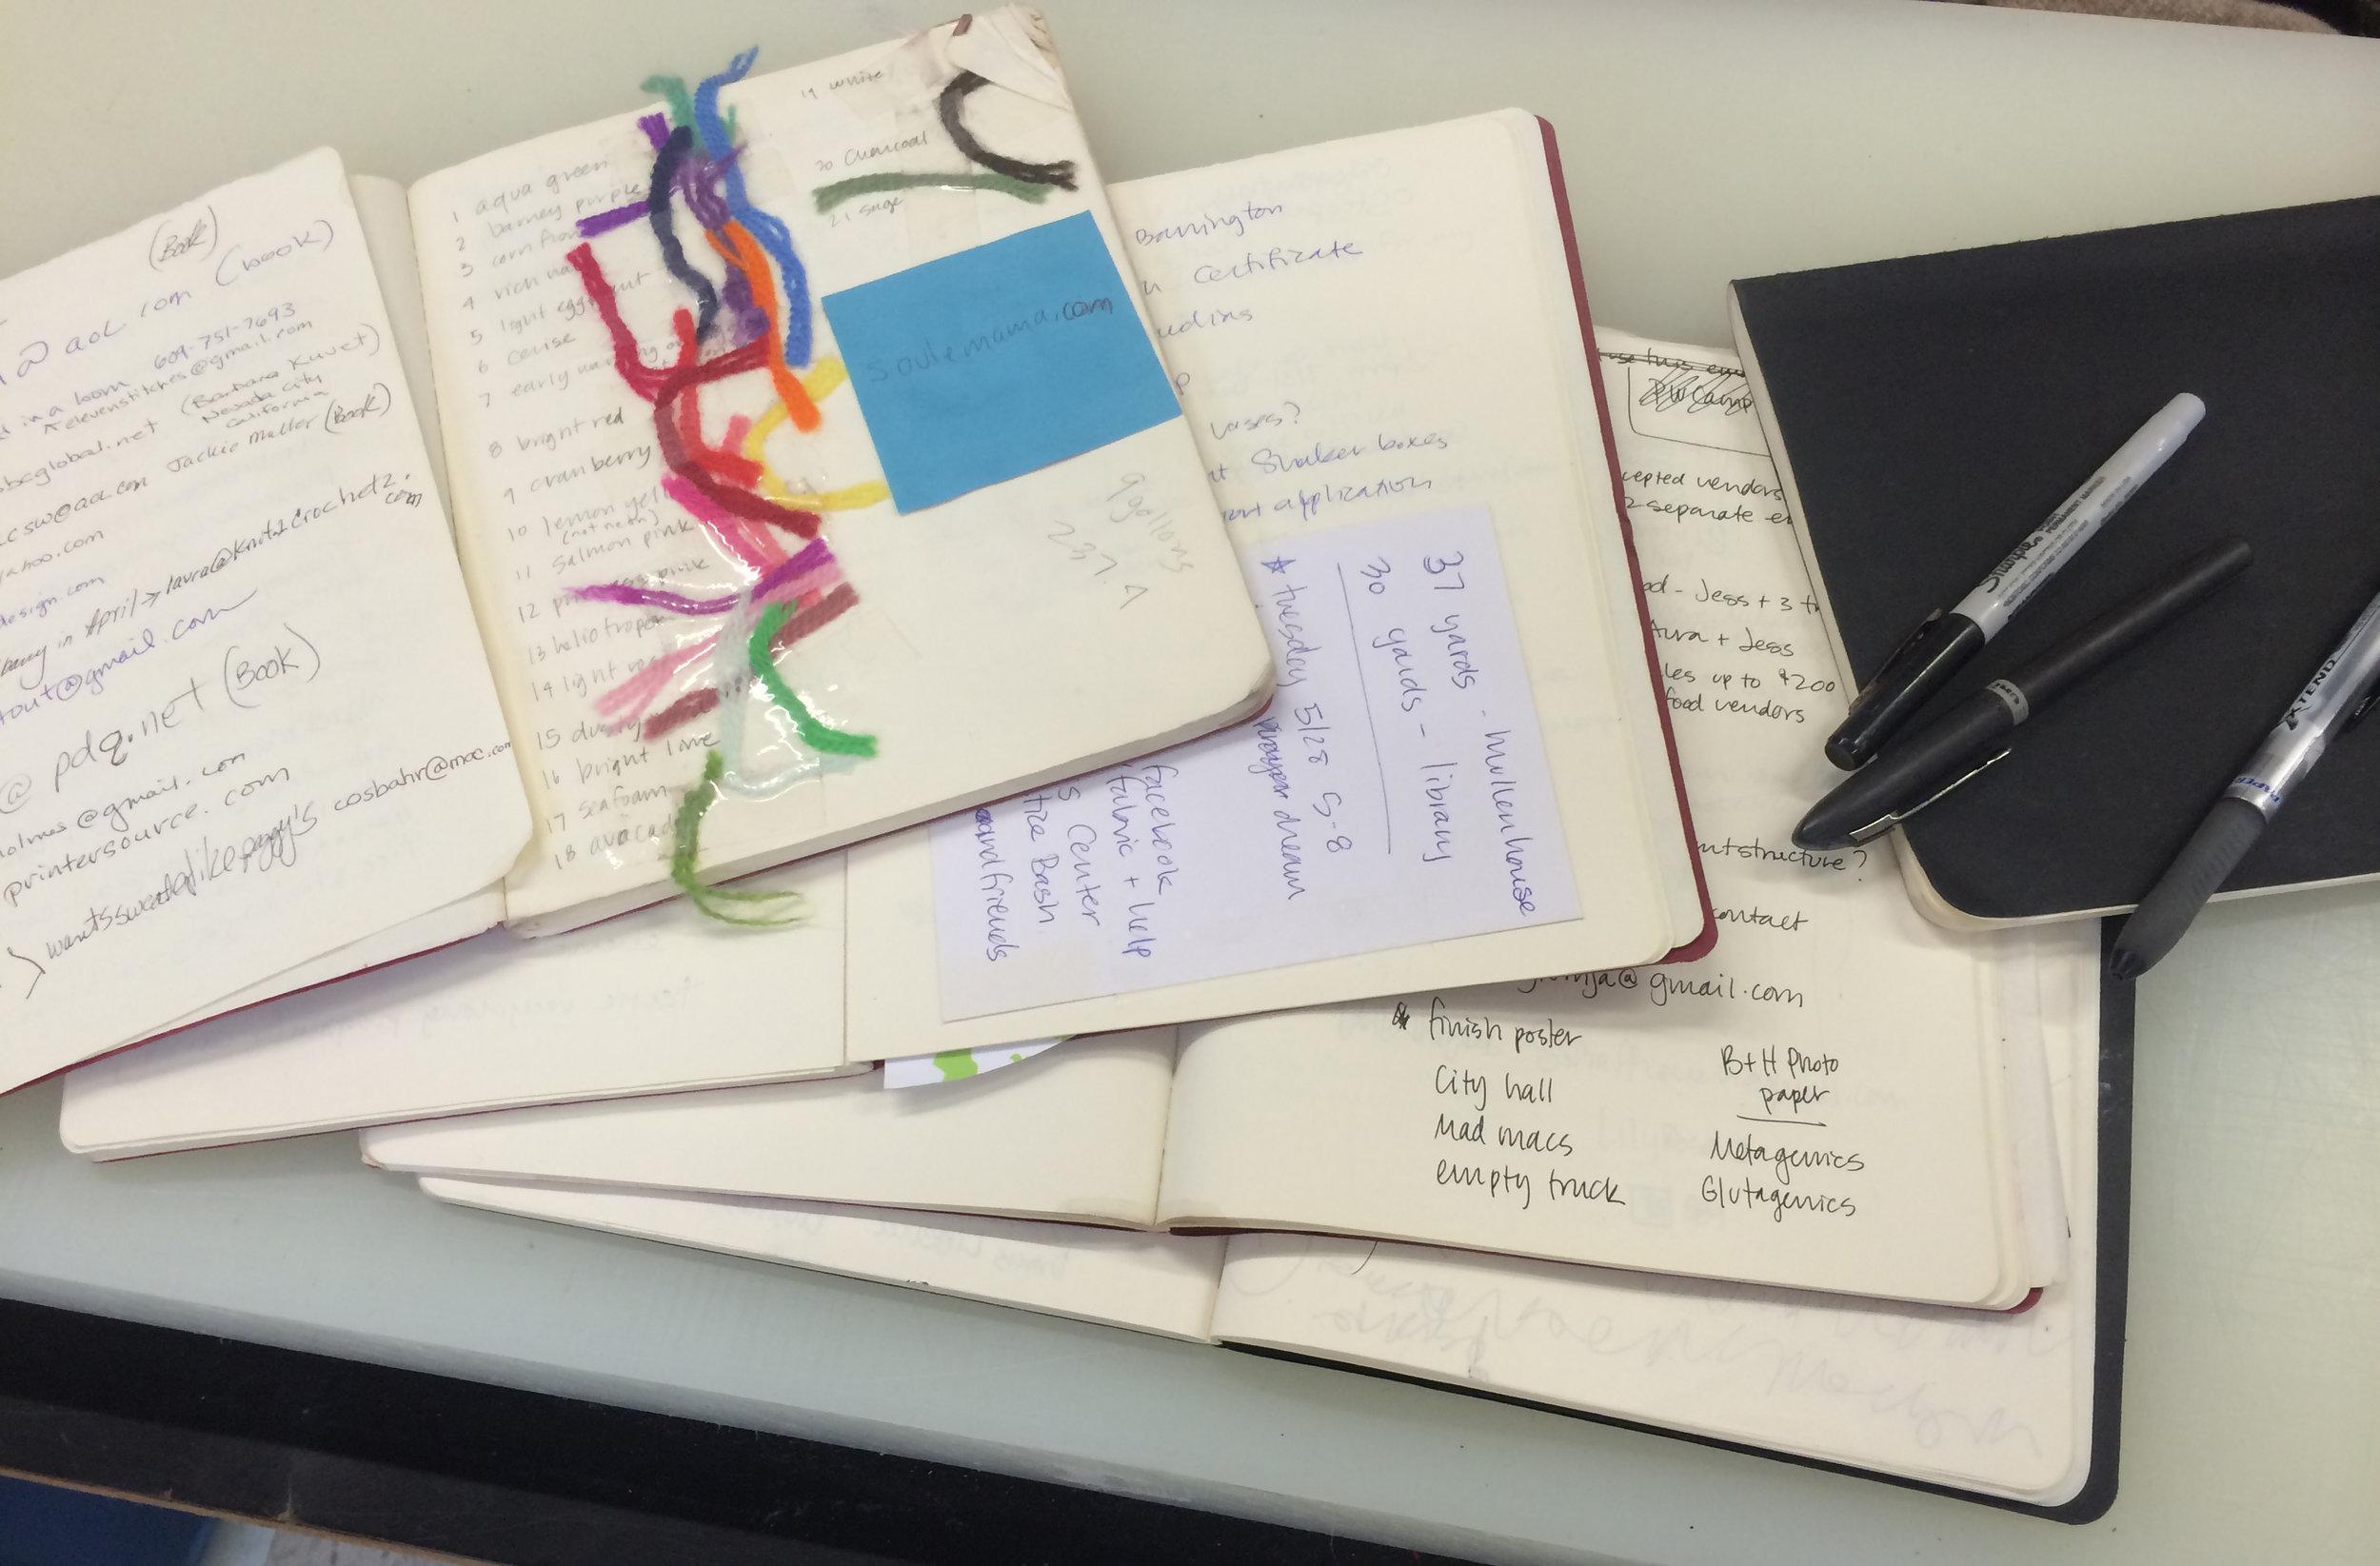 12.01.14 Journals